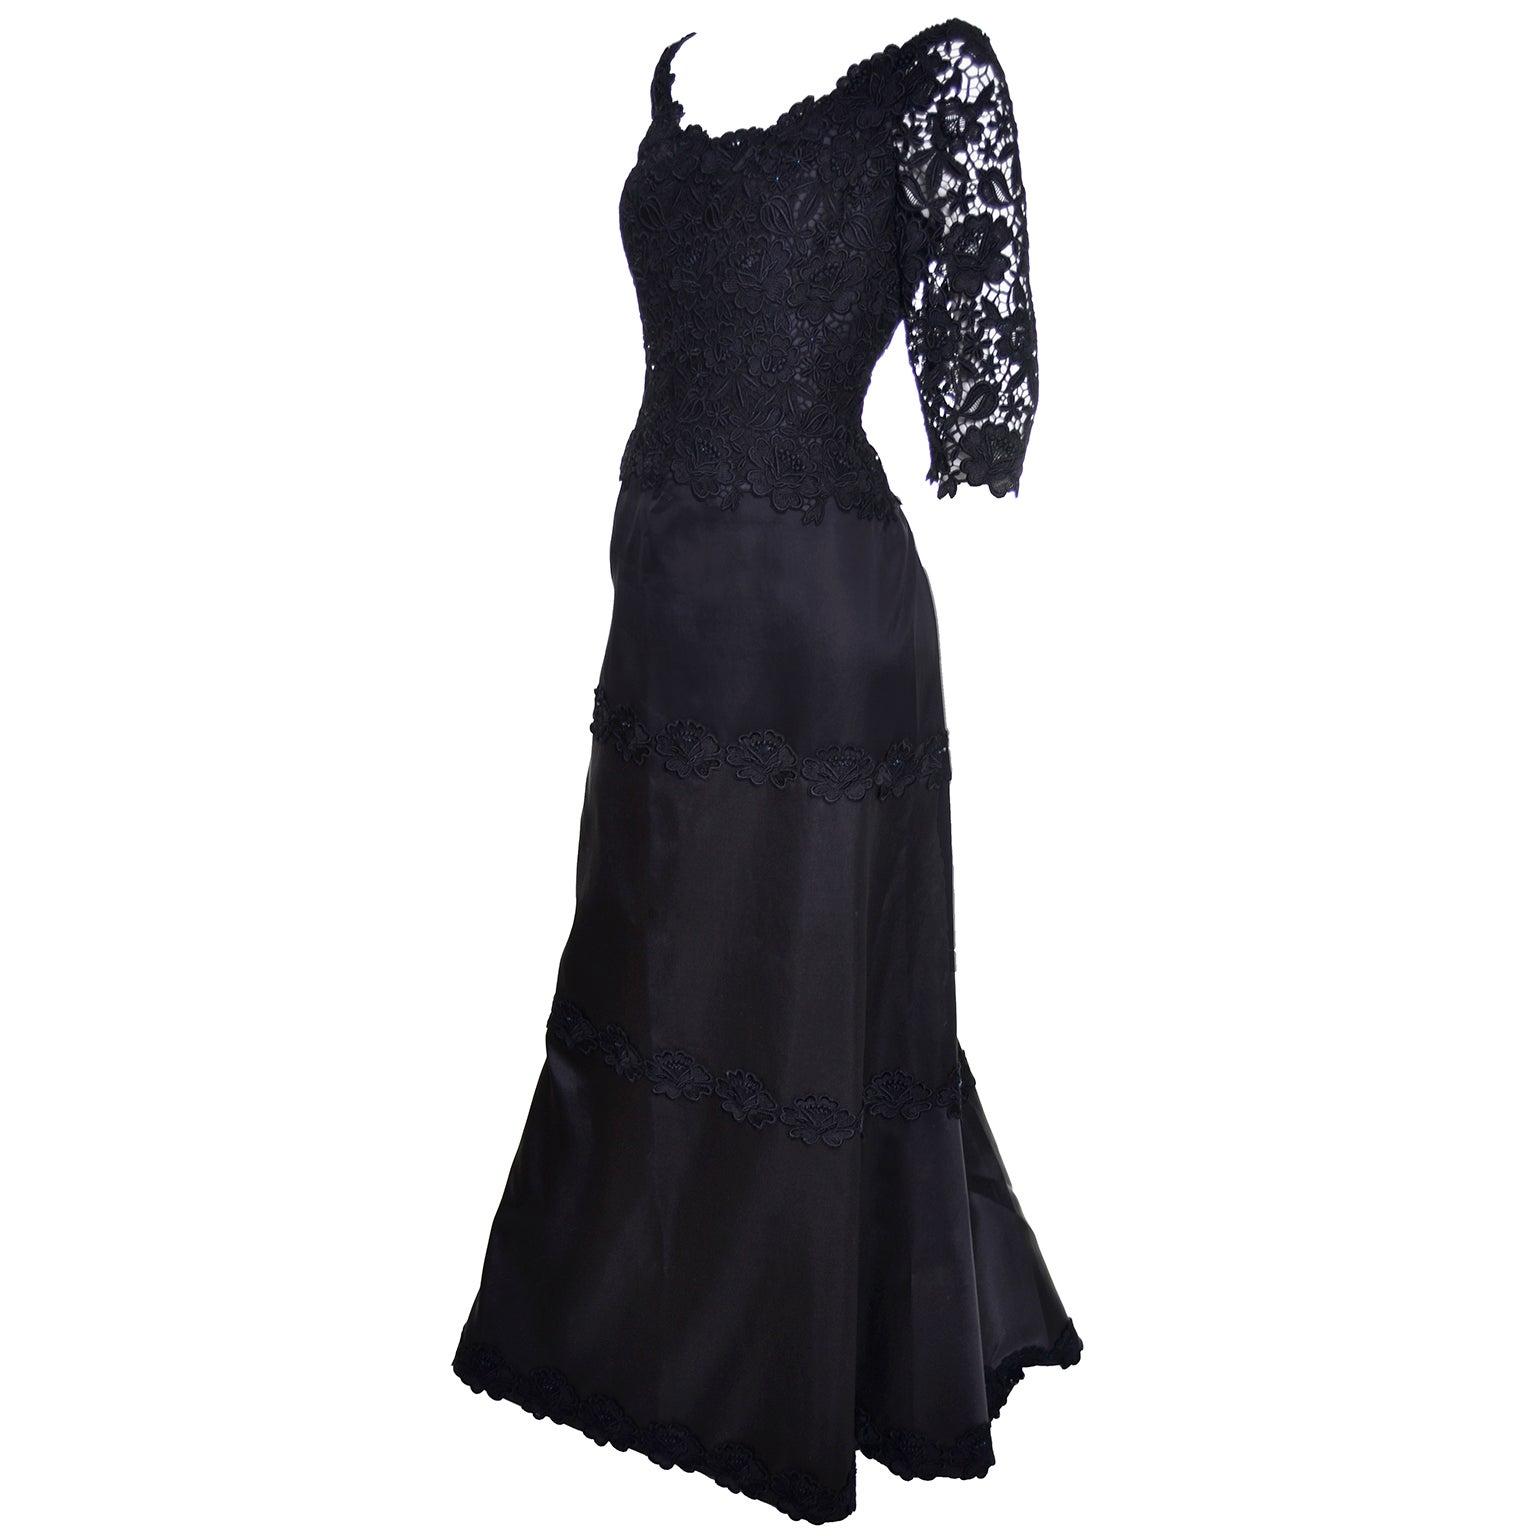 Helen Morley Bergdorf Goodman Vintage Dress Lace Satin ...